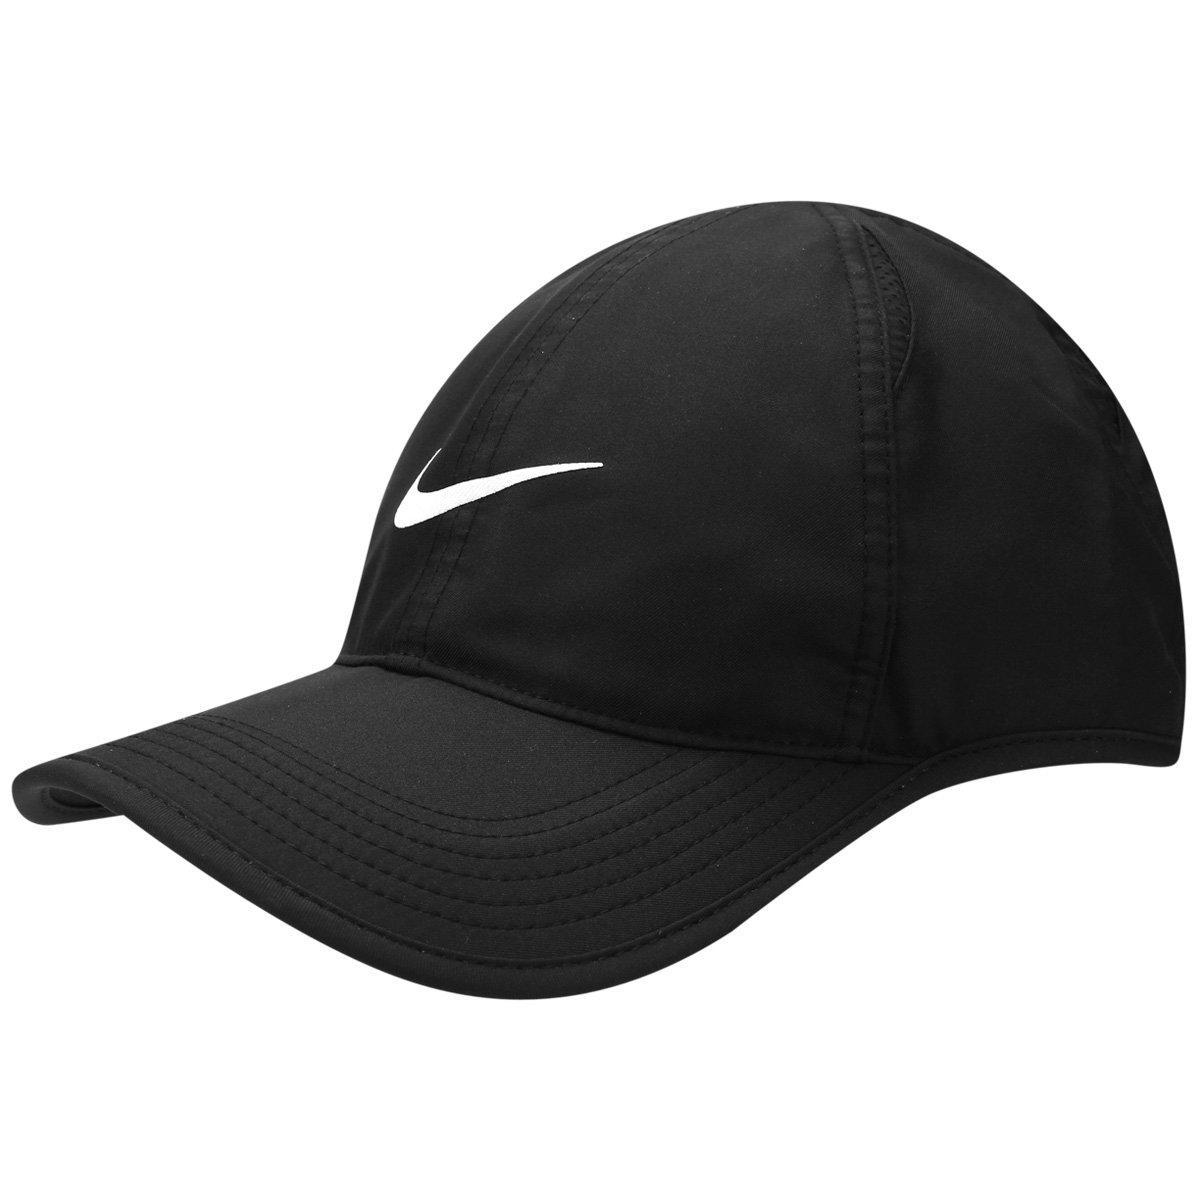 Boné Nike Aba Curva Featherlight - Preto - Compre Agora  a503b81a81a70